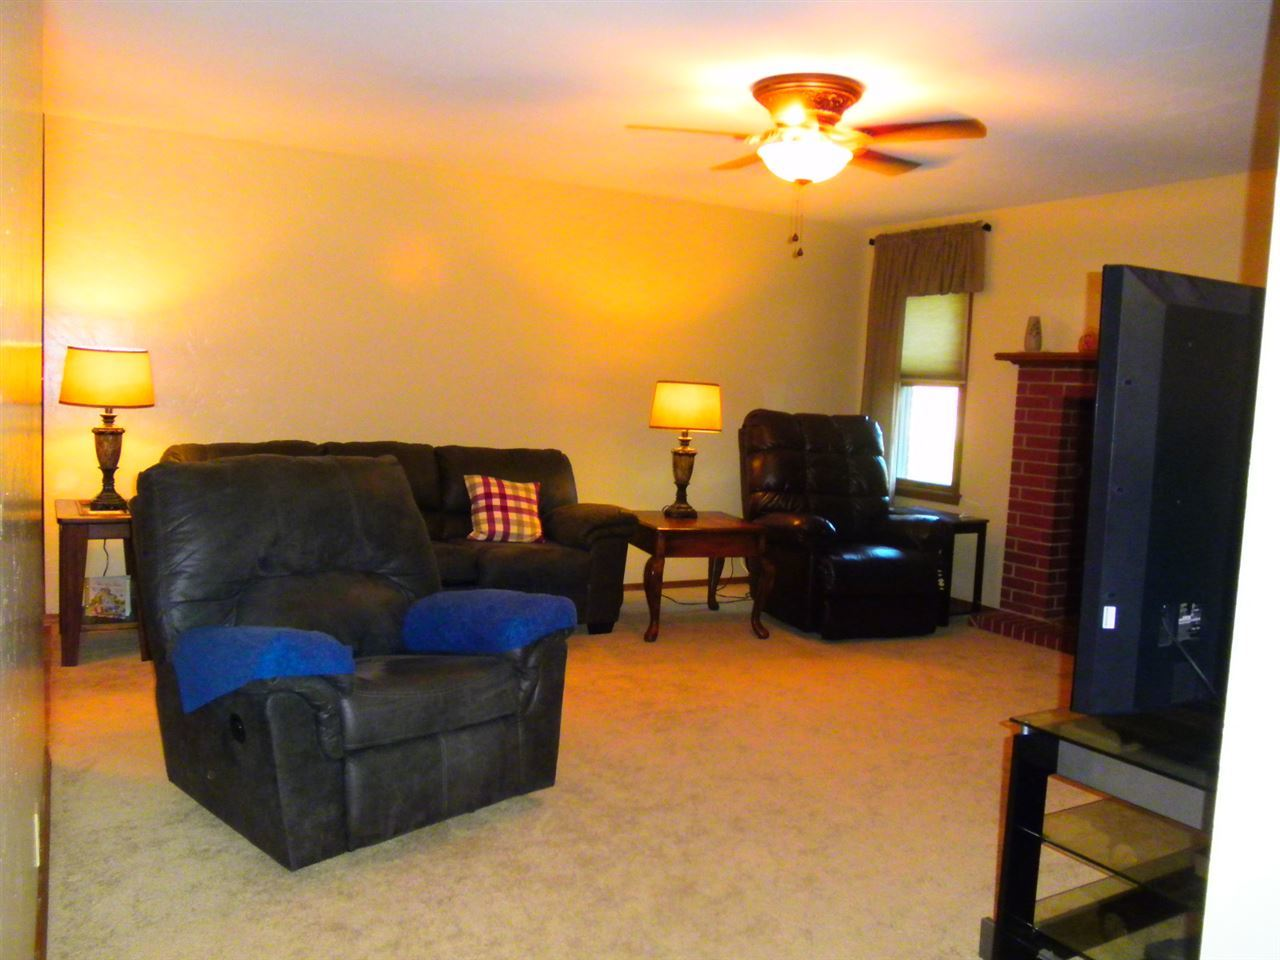 Sold Cross Sale W/ MLS | 32 Raintree Ponca City, OK 74604 1